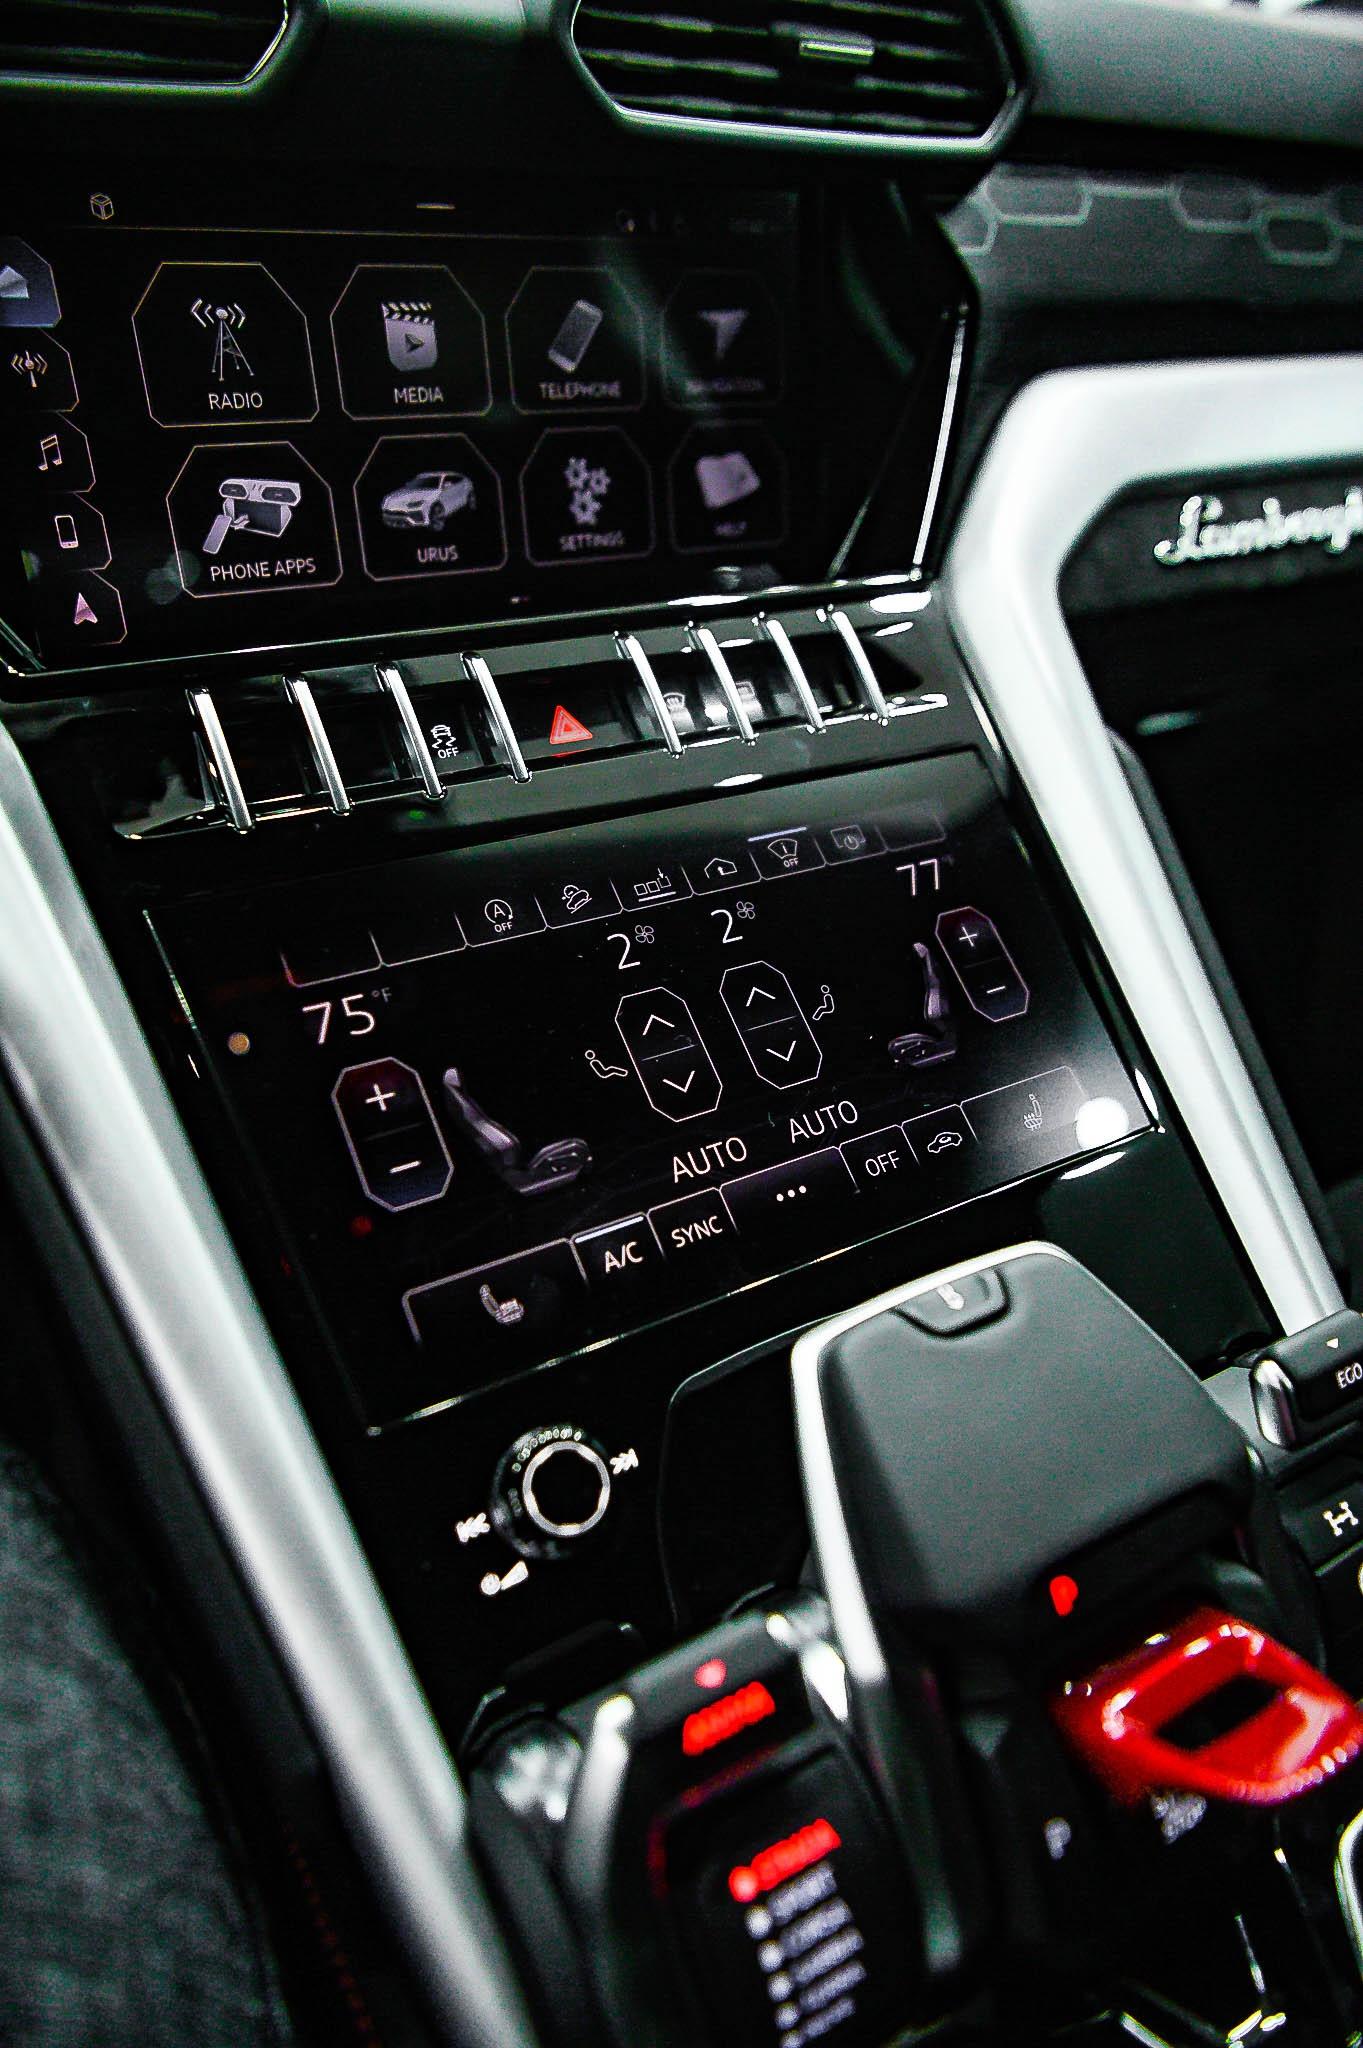 Ngam Lamborghini Urus mau den dau tien ve VN, gia khoang 1 trieu USD hinh anh 41 Urus_zing_10__1.jpg